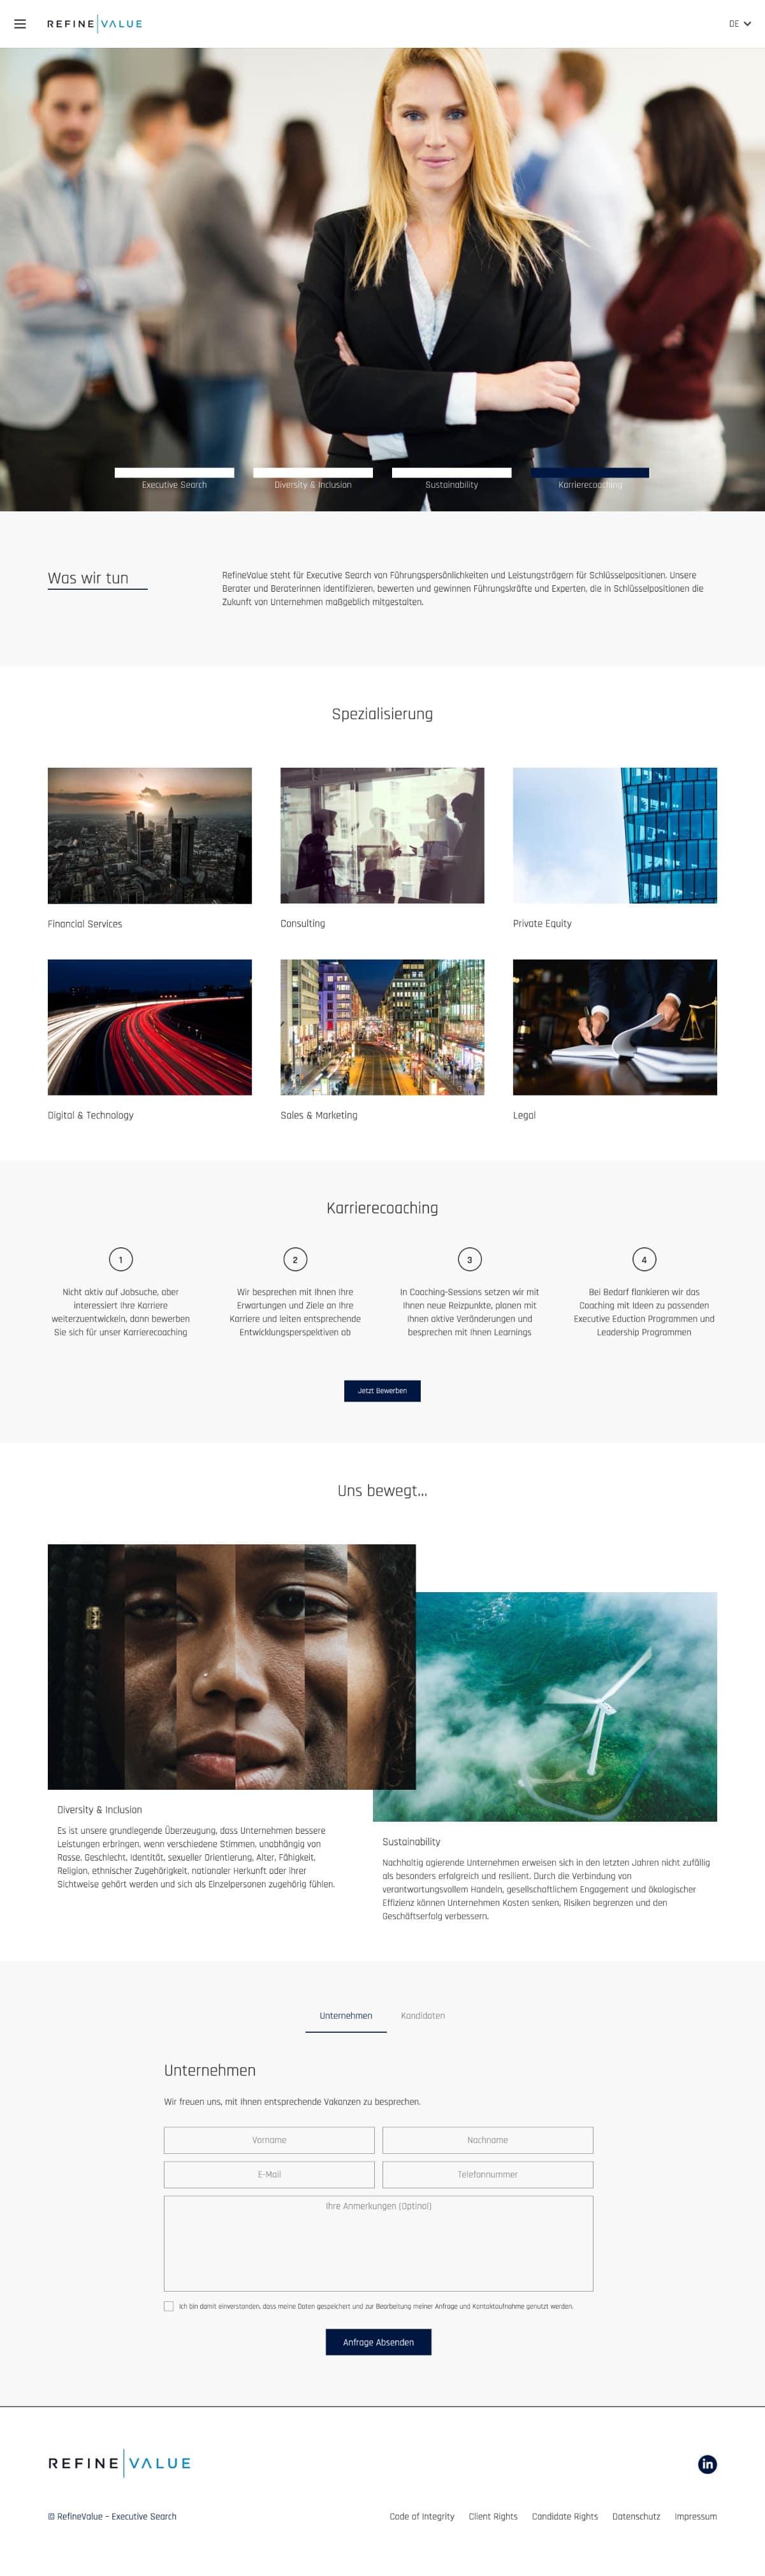 RefineValue Executive Search Website